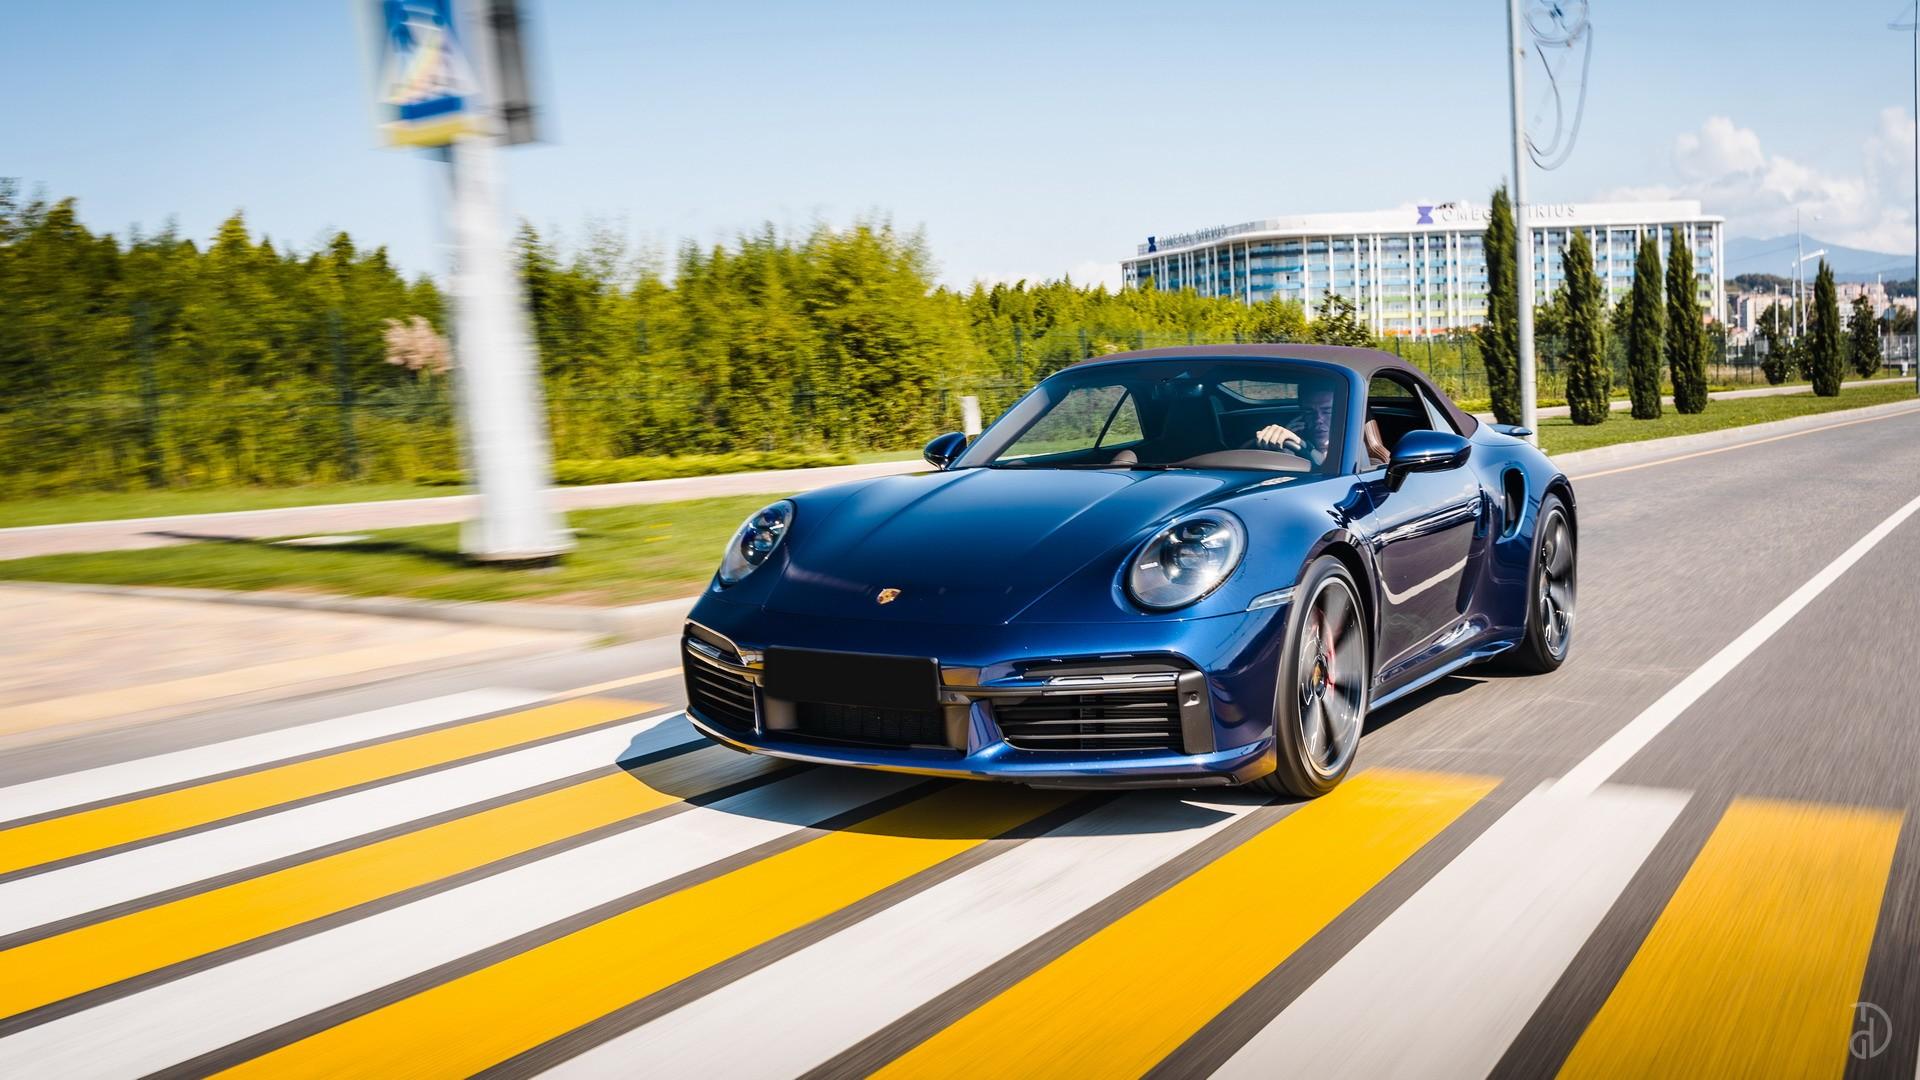 Аренда Porsche 911 Turbo (992) в Сочи. Фото 10